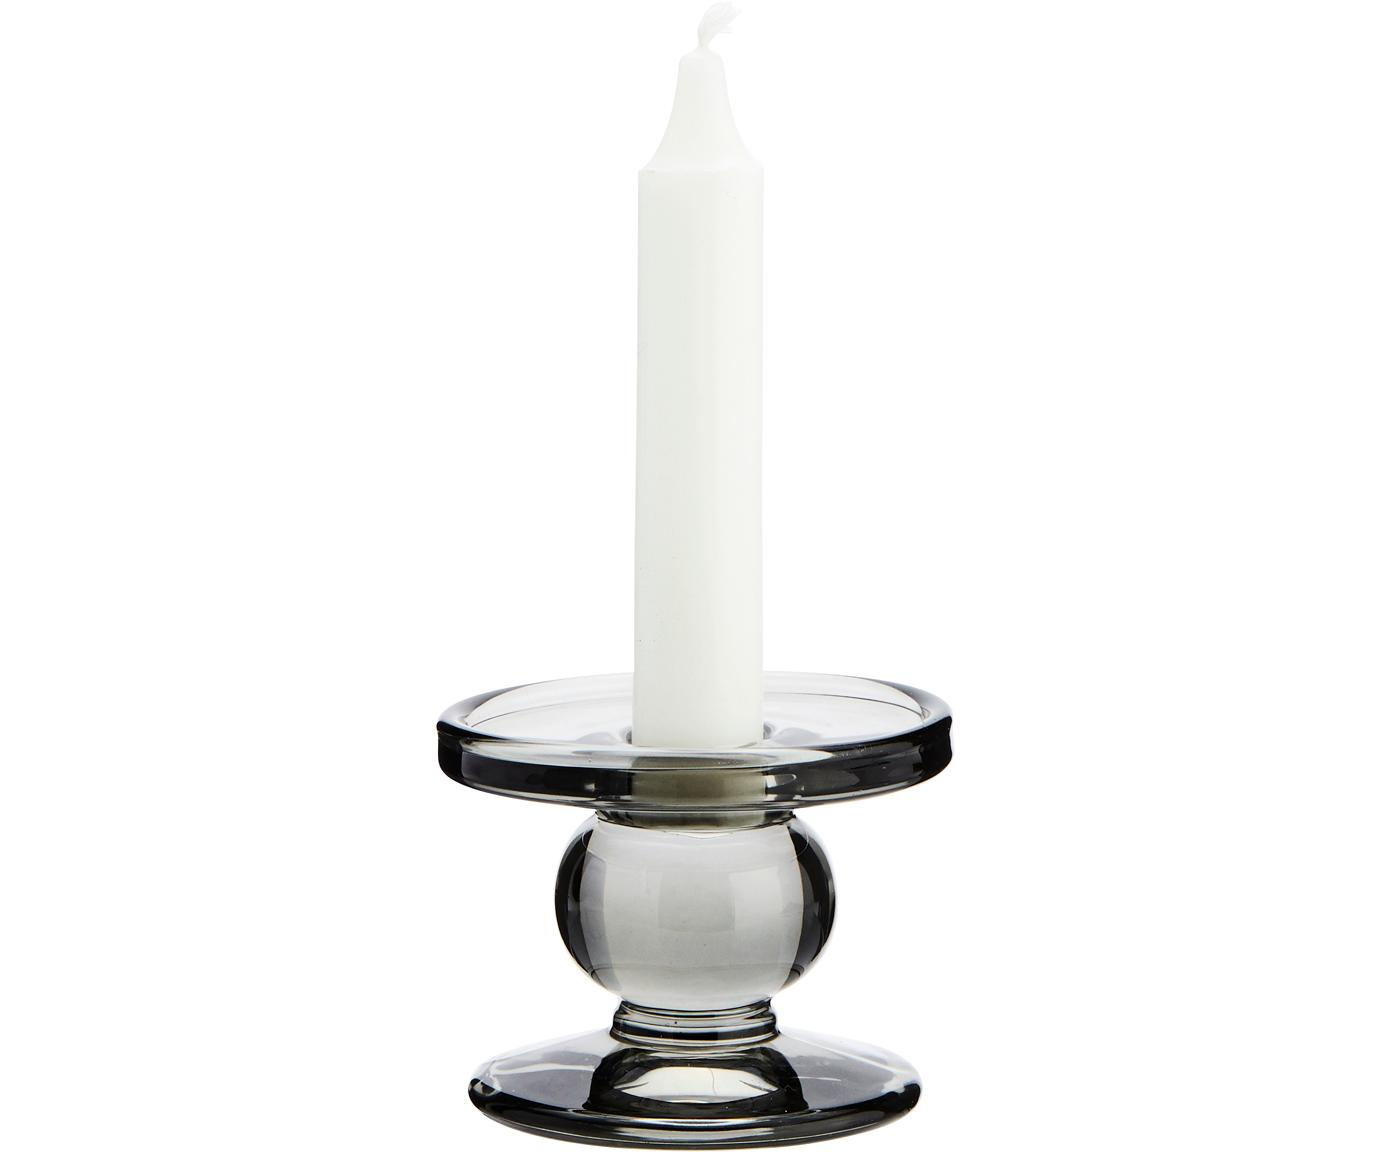 Kerzenhalter Andre, Glas, Grau, Ø 8 x H 7 cm